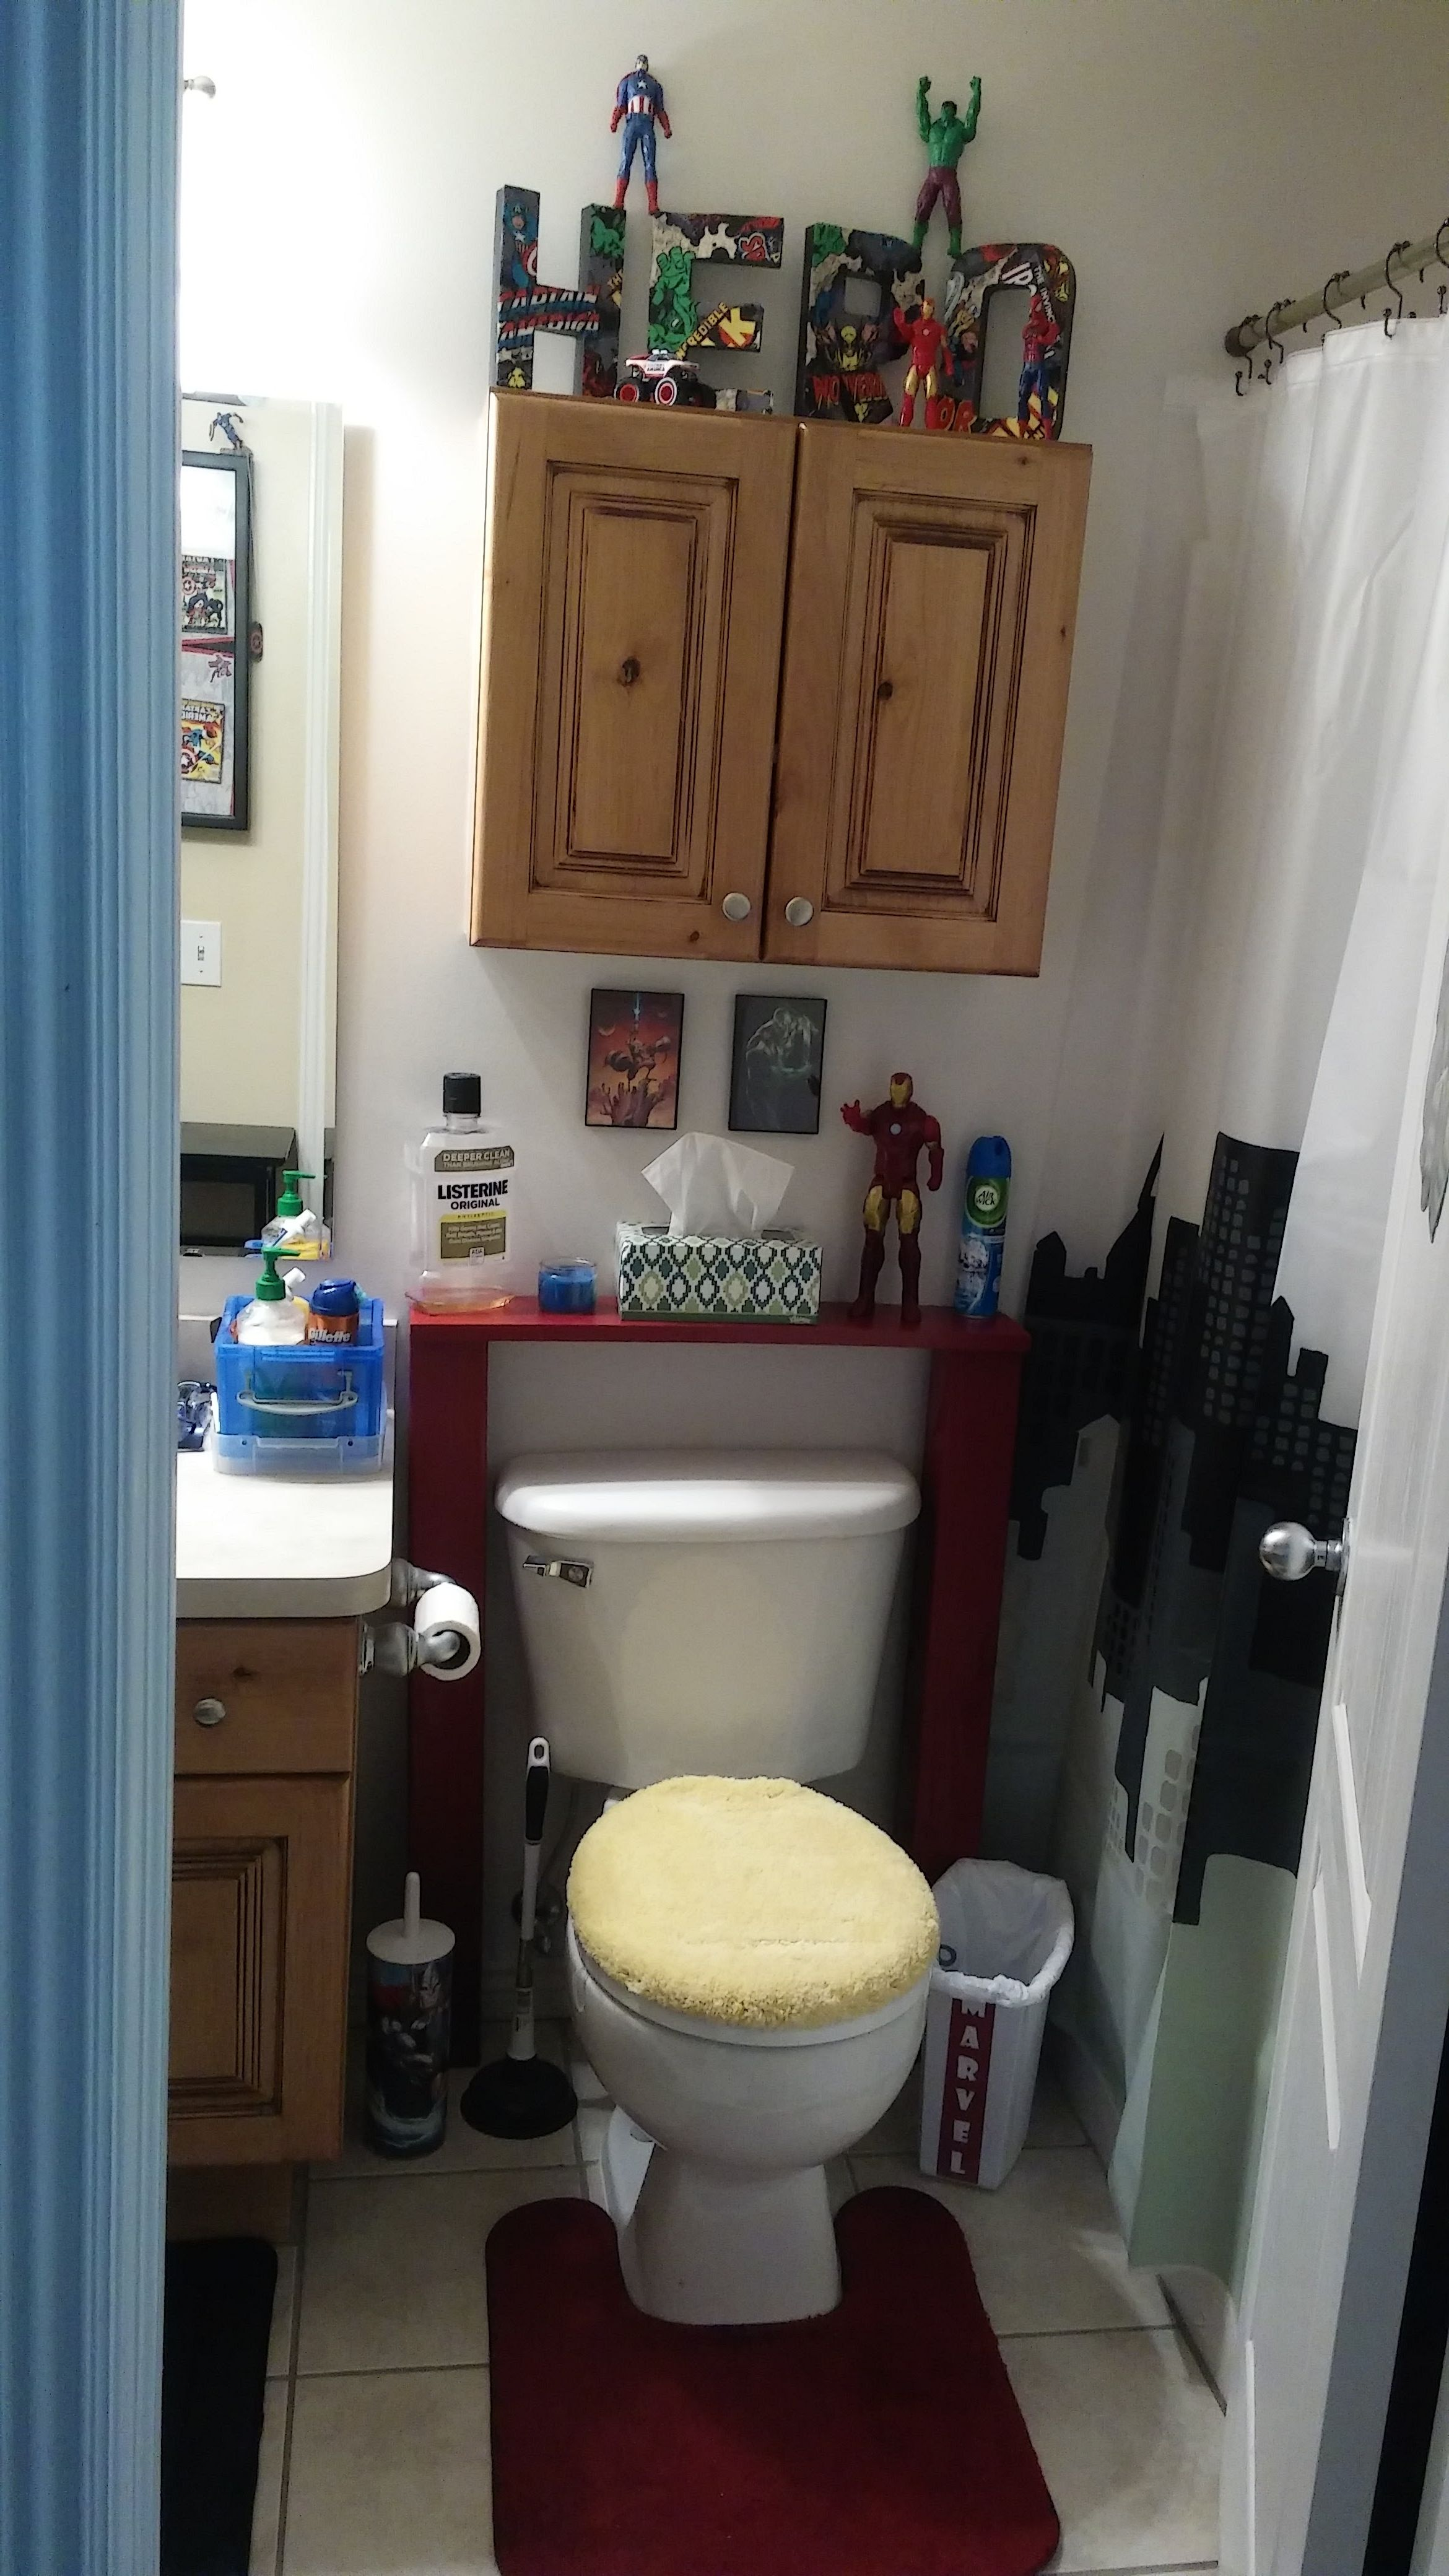 Marvel Superhero Bathroom! Iron Man - AKA Iron Can!! Ha ...